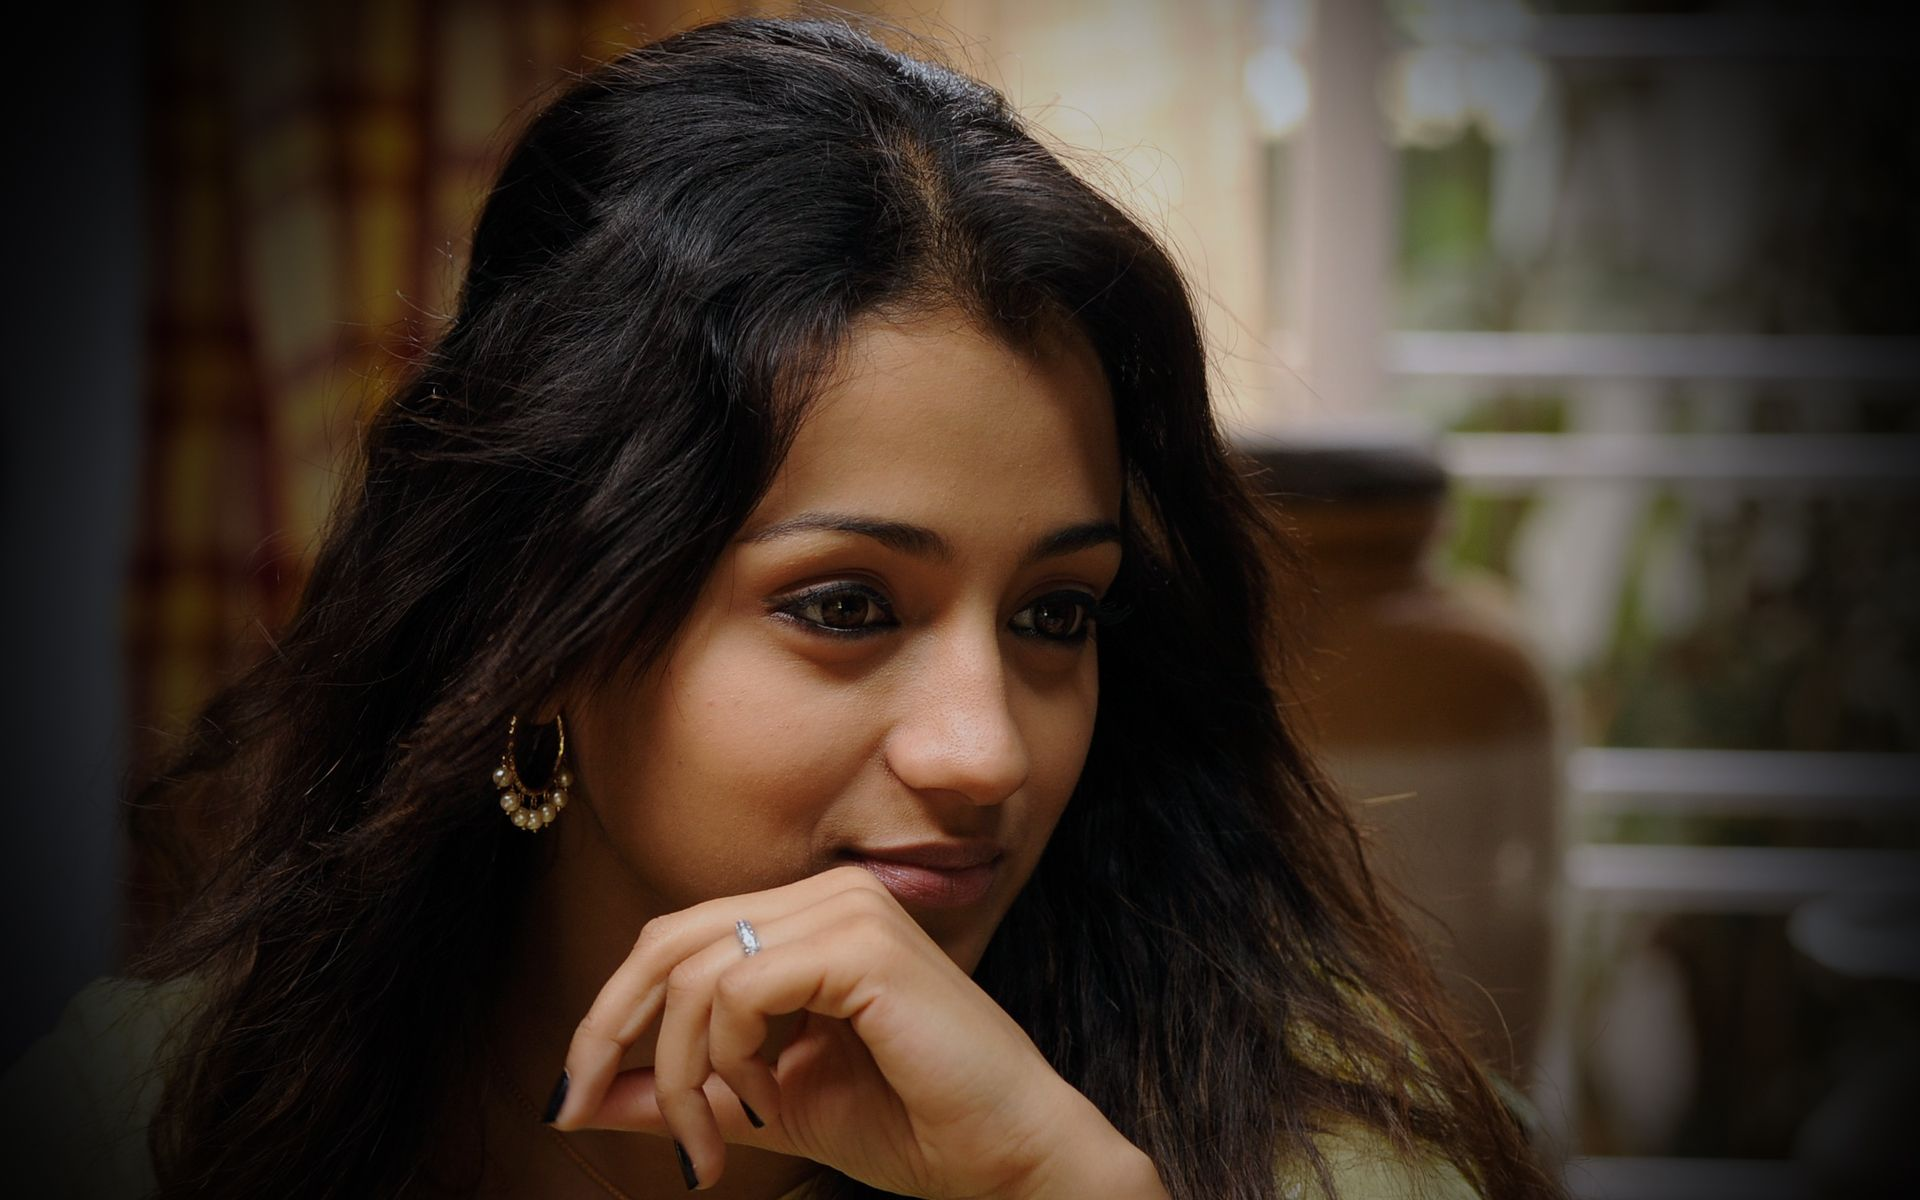 Uhd Wallpapers Girl 9 Hd Trisha Krishnan Wallpapers